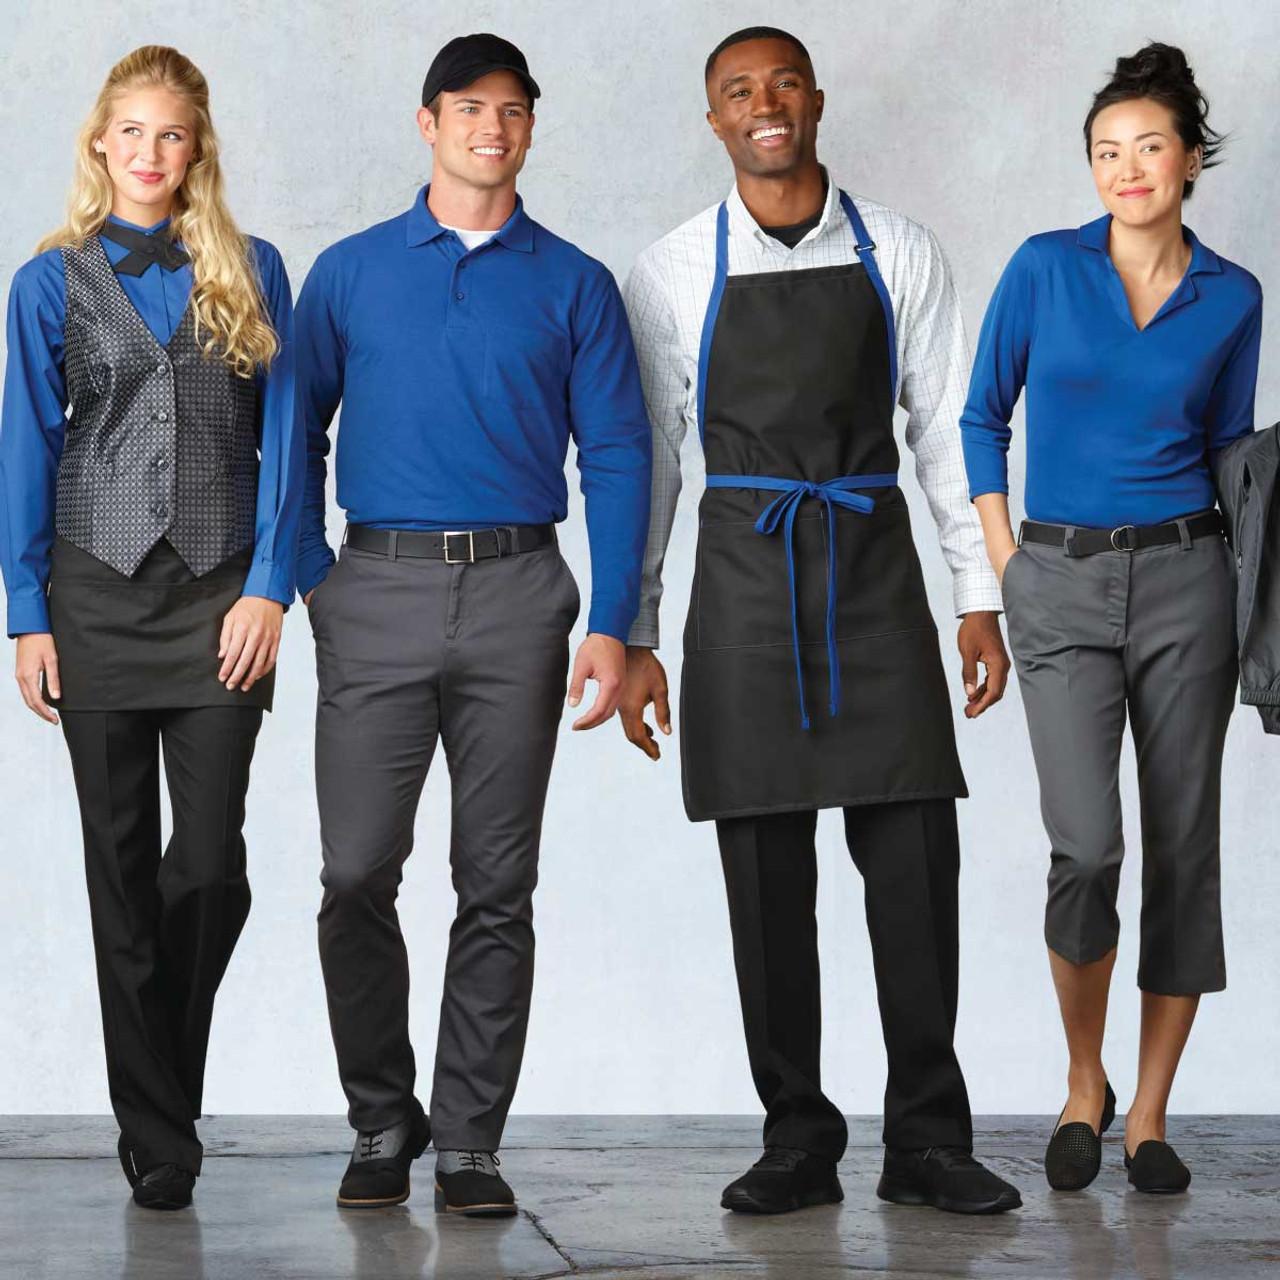 Uniform Samples for Hotels and Restaurants